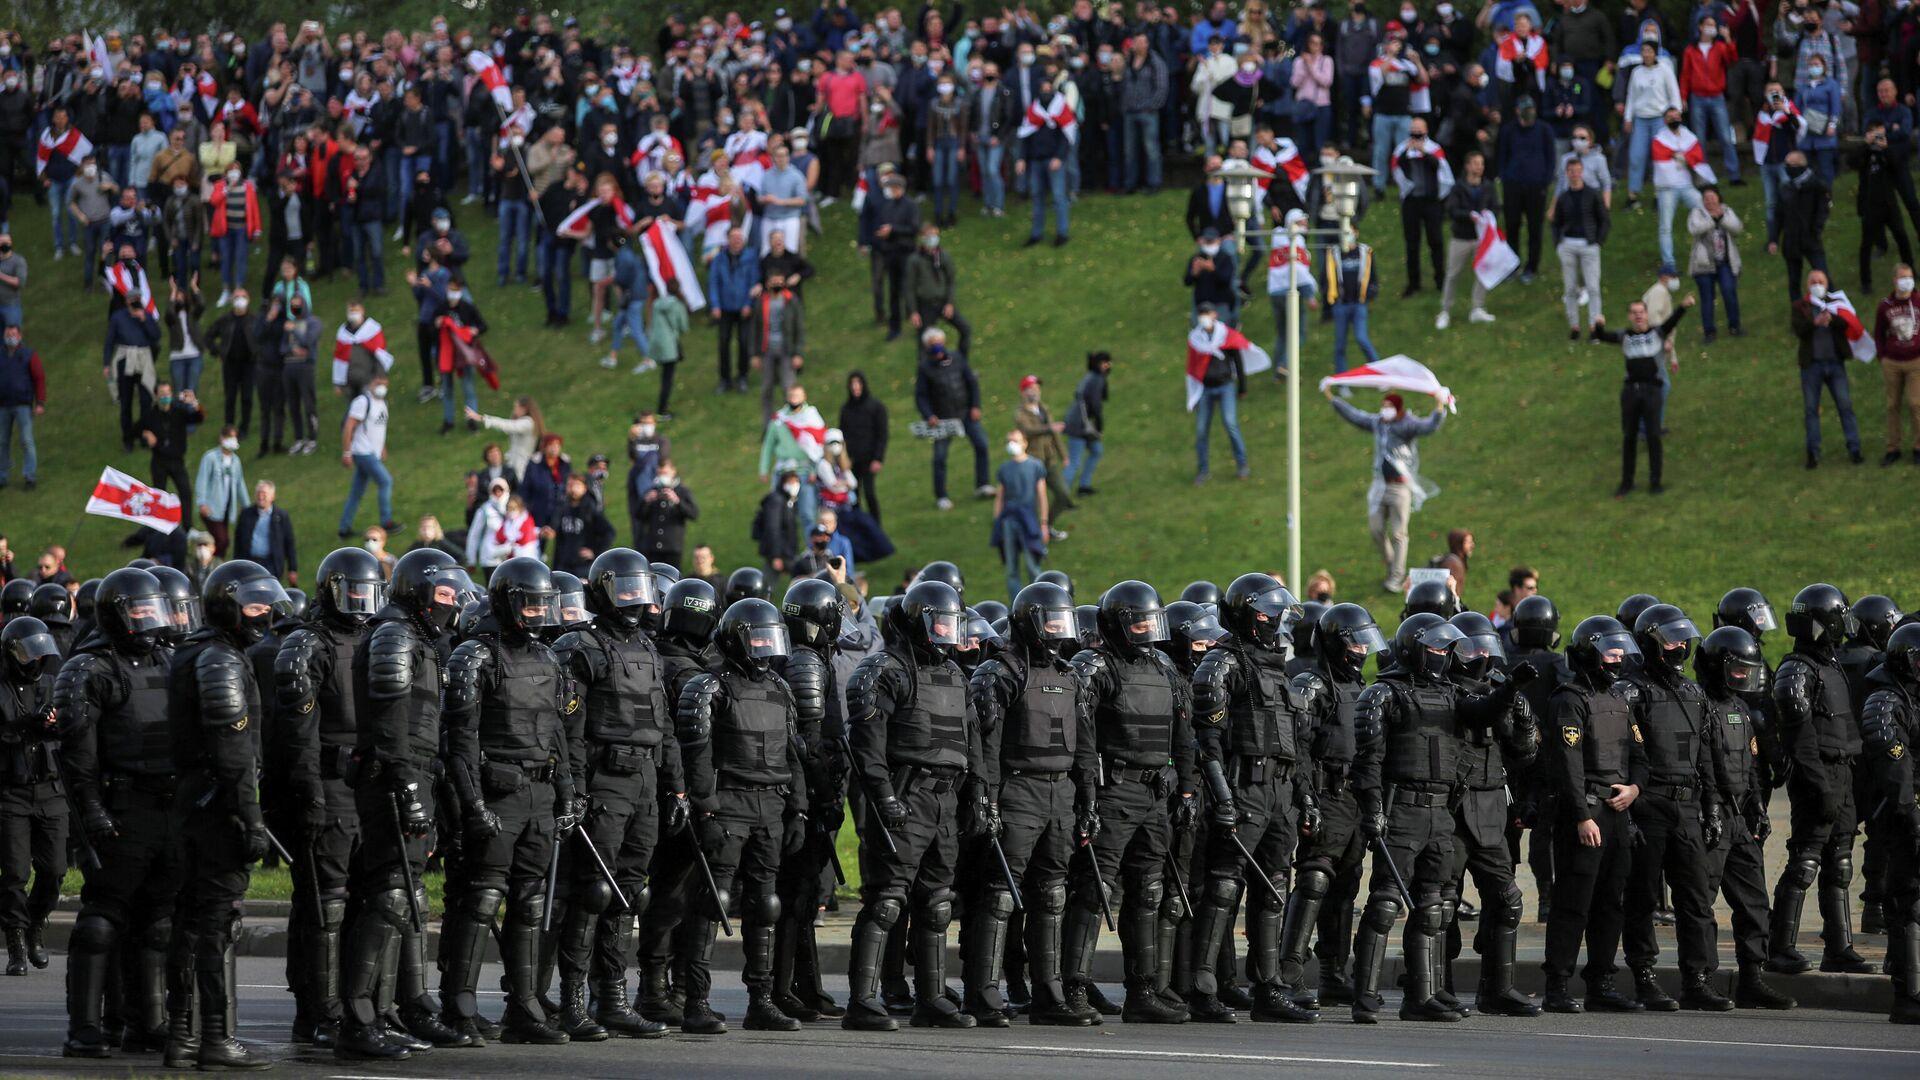 Во время акции протеста в Минске. 4 октября 2020  - РИА Новости, 1920, 11.10.2020